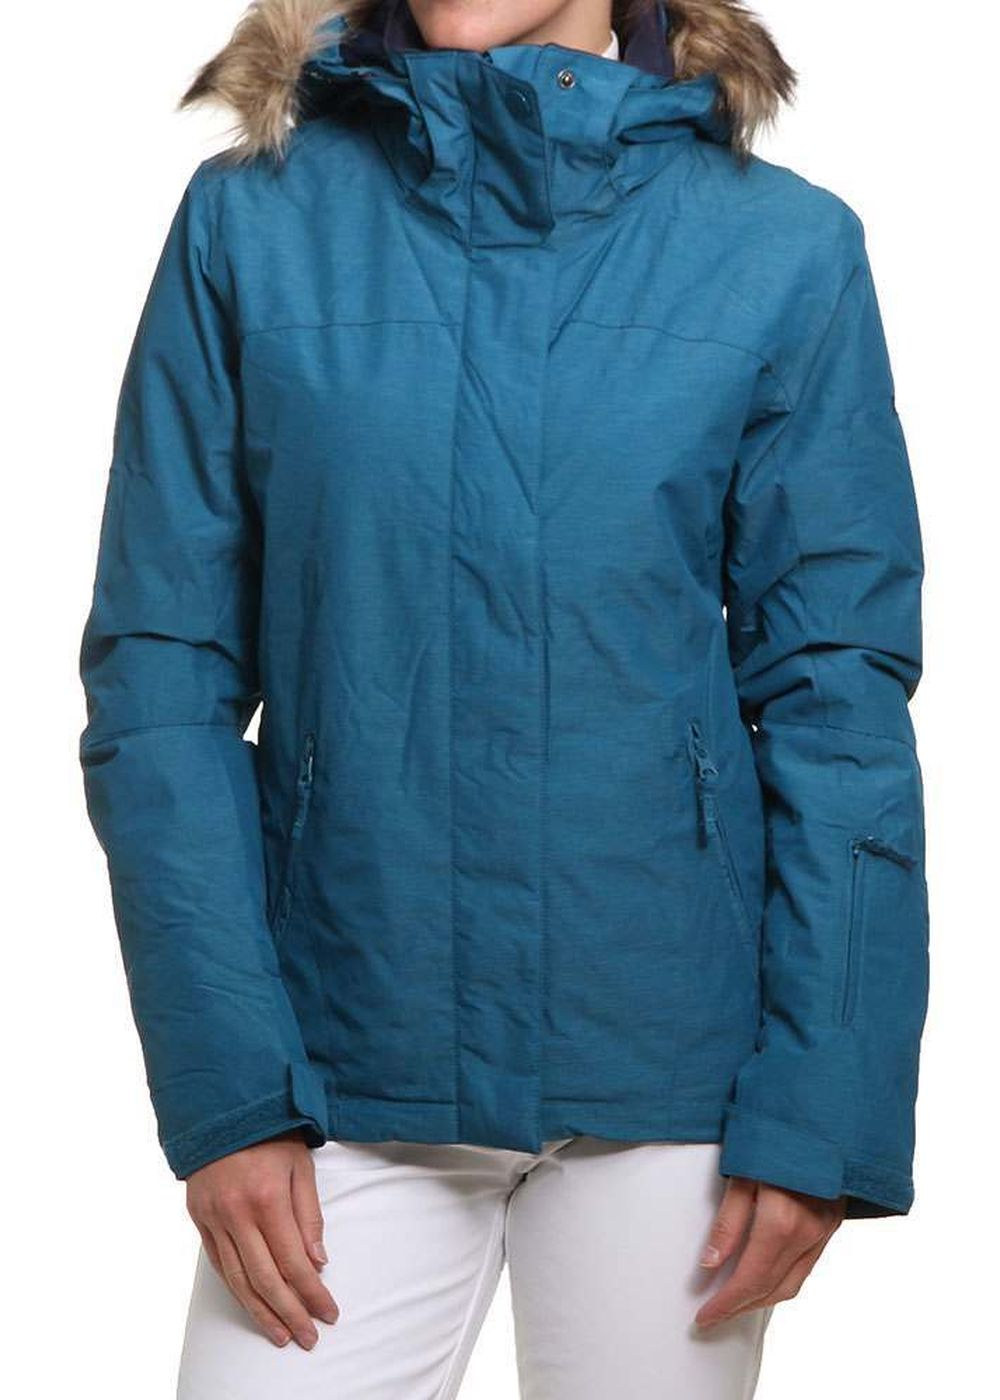 roxy-jet-ski-solid-snow-jacket-ink-blue